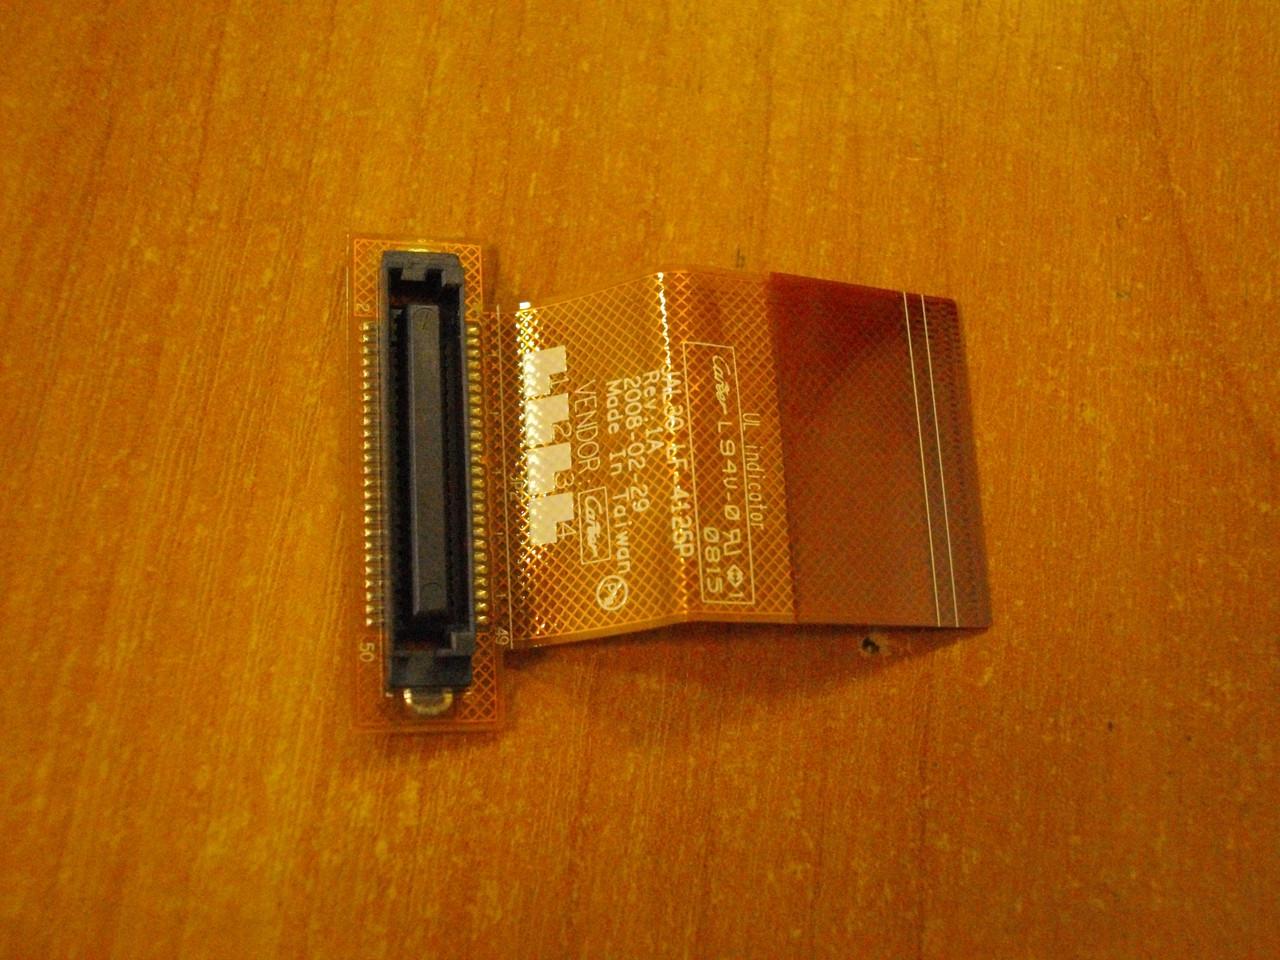 Переходник подключения LF--4125P DVD DELL Vostro 1510 PP36L бу